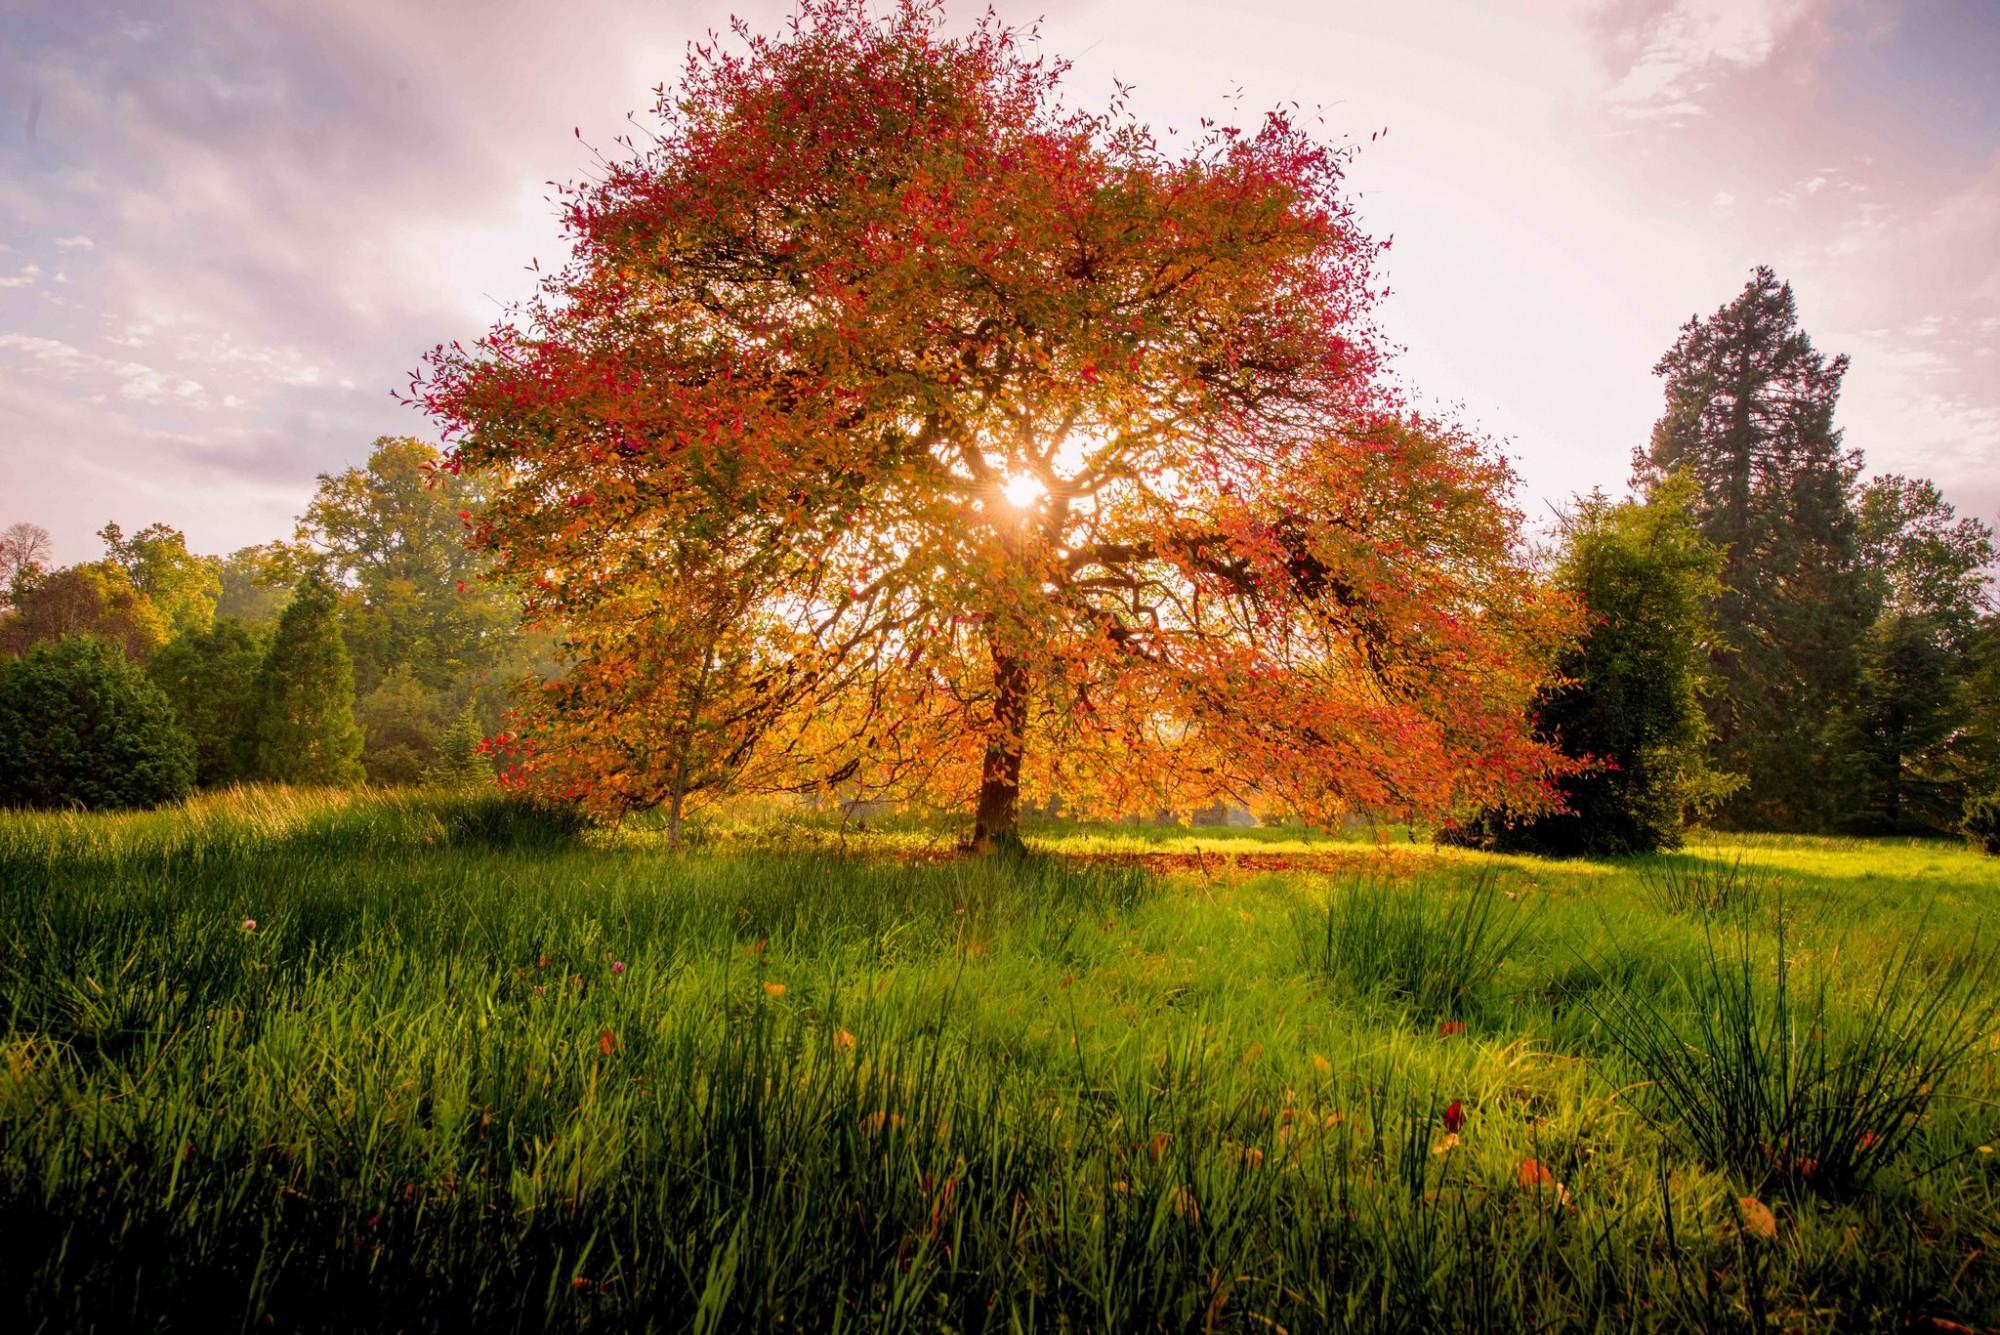 A beautiful tree at wakehurst with orange leaves